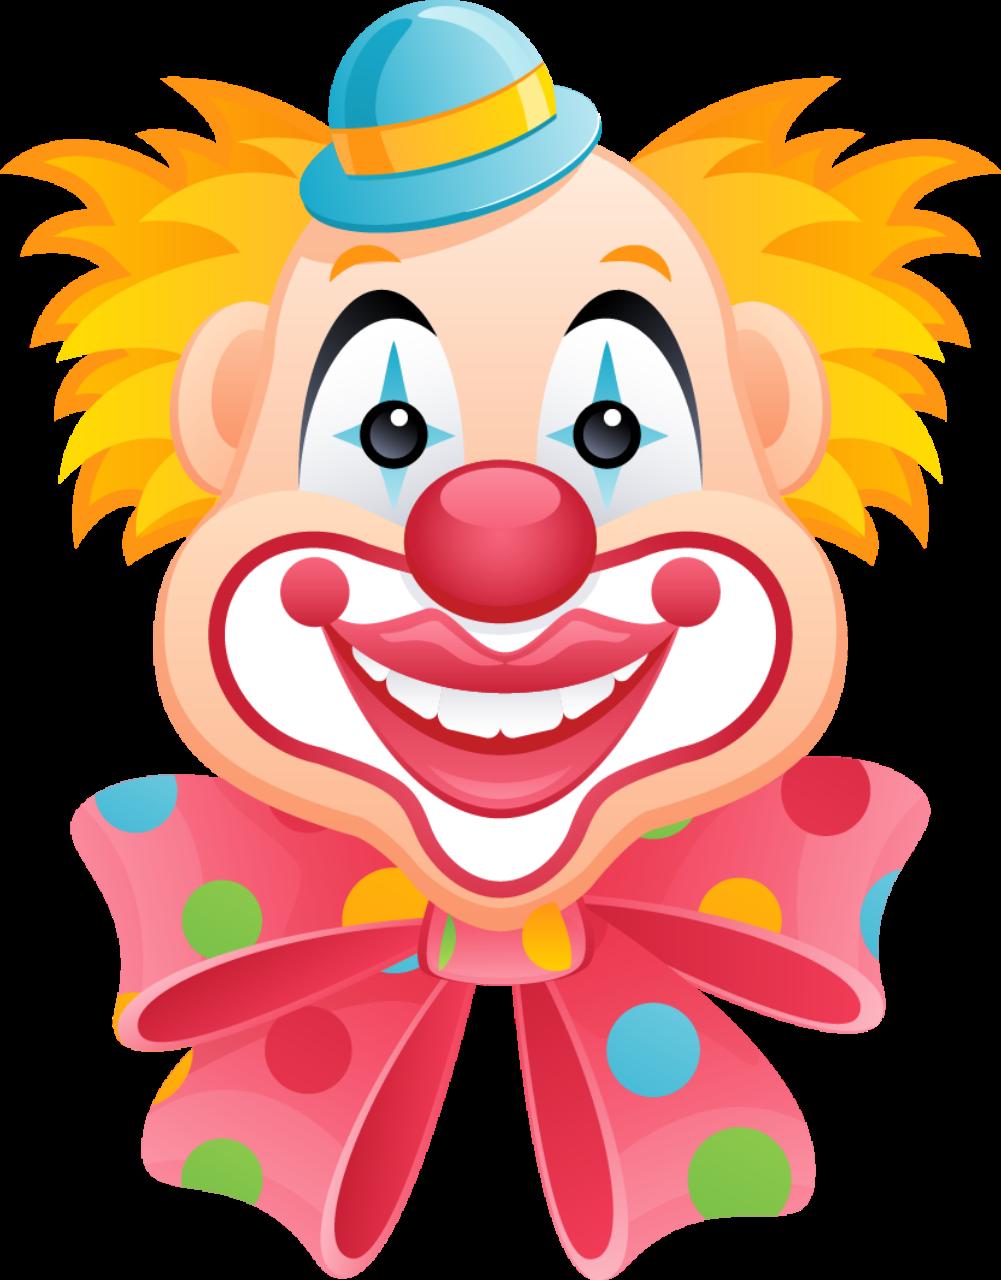 happy clown faces pictures - HD800×1024